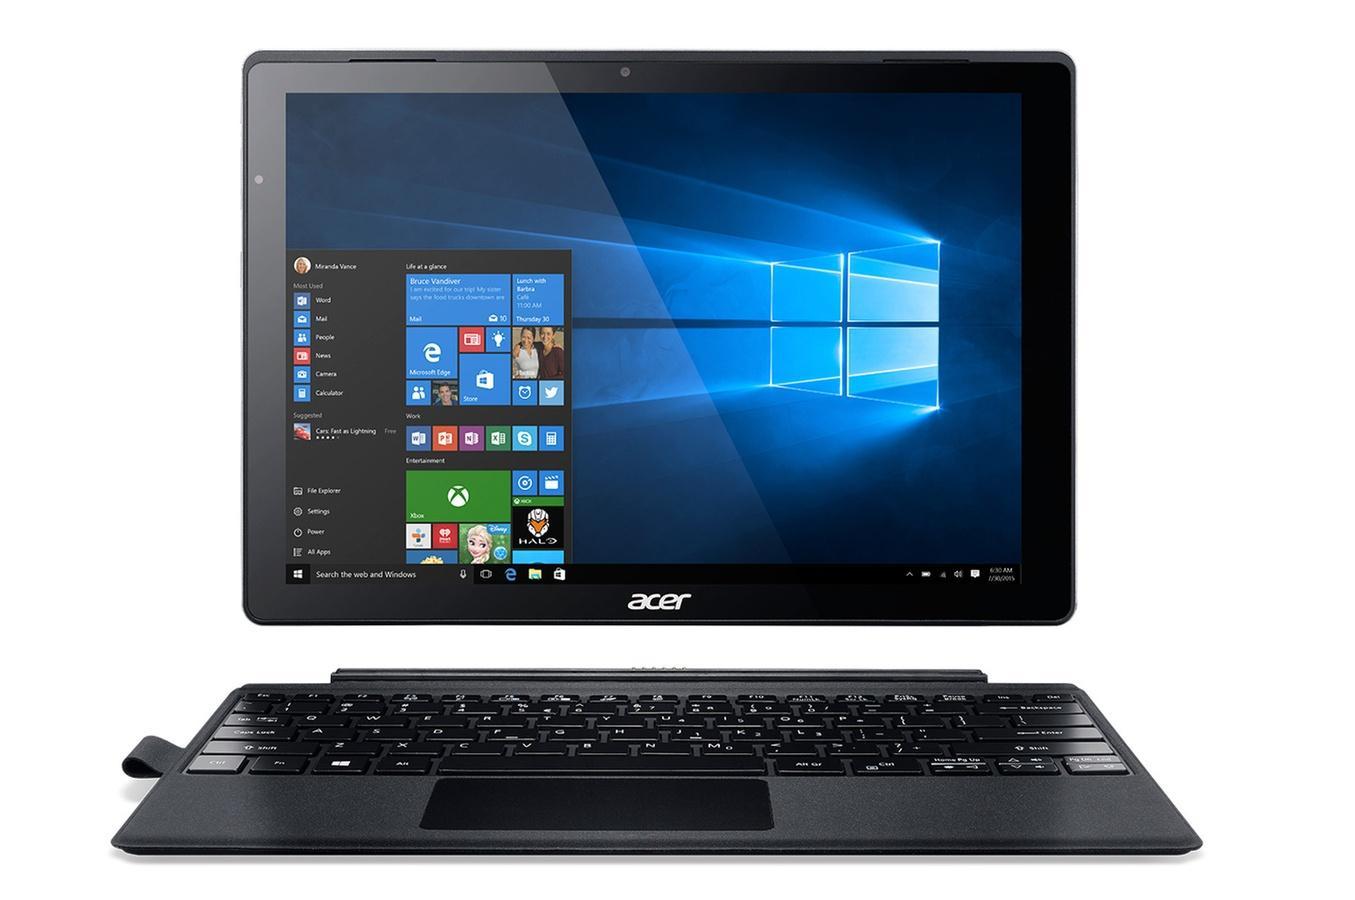 PC 2-en-1 Acer Switch Alpha 12 SA5-271-39QM - i3-6100U, 128Go SSD, 4Go de Ram (+ 40€ en carte cadeau)